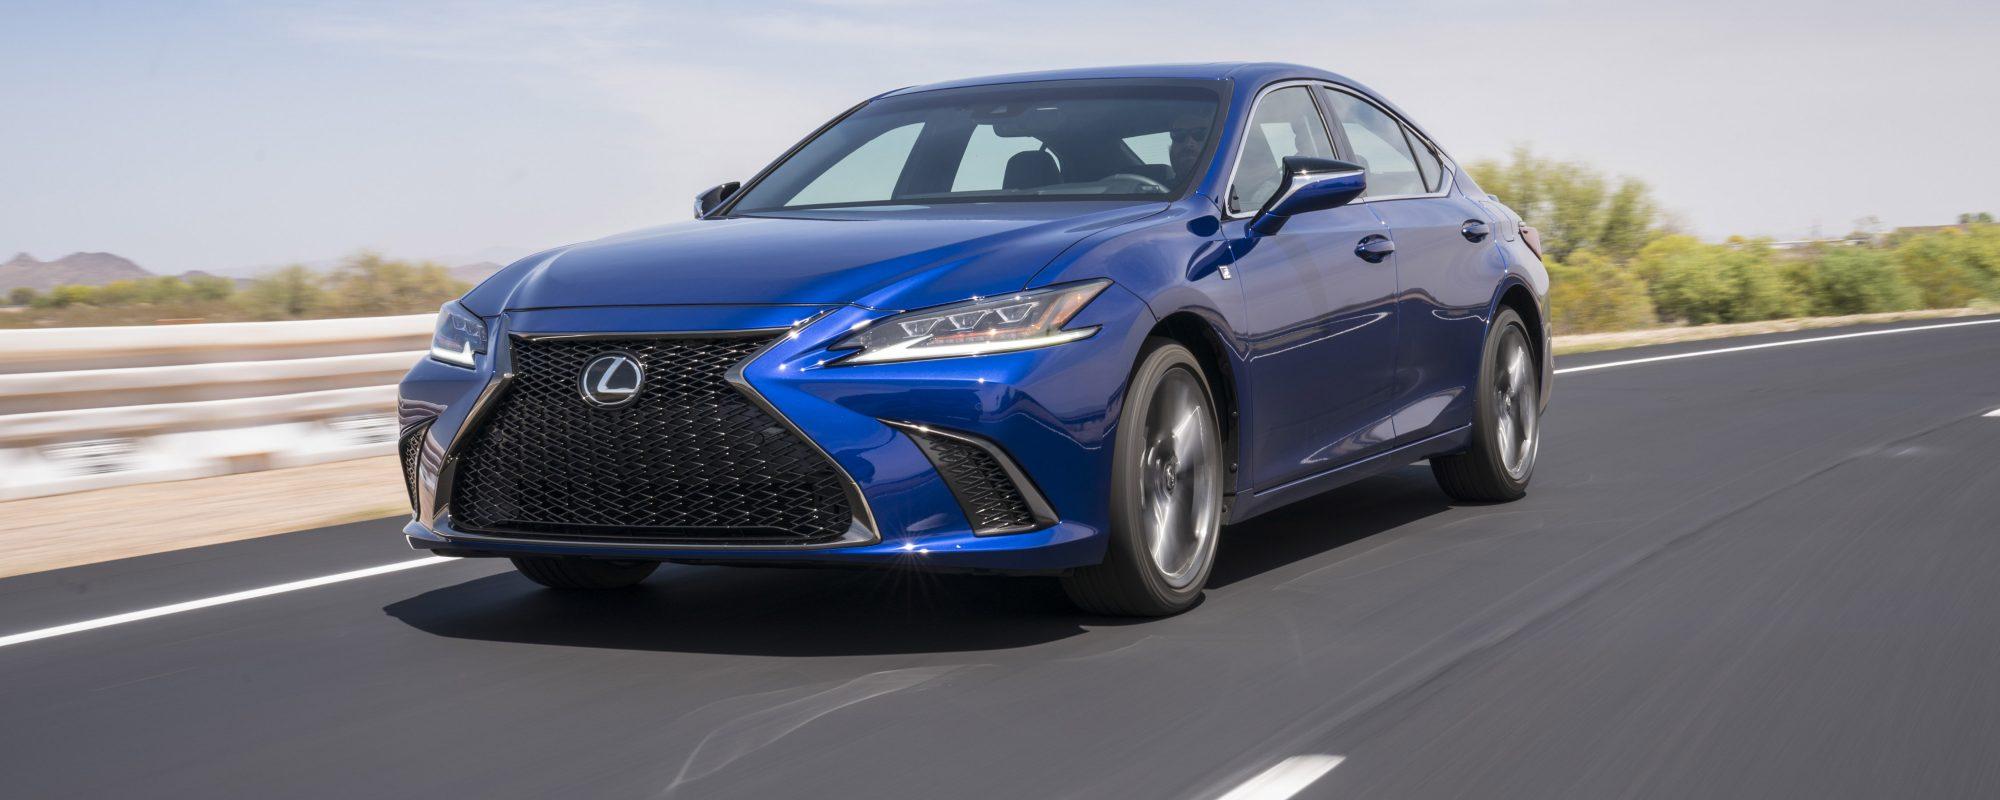 Optimale prestaties en verfijning op hoogste niveau in nieuwe Lexus ES